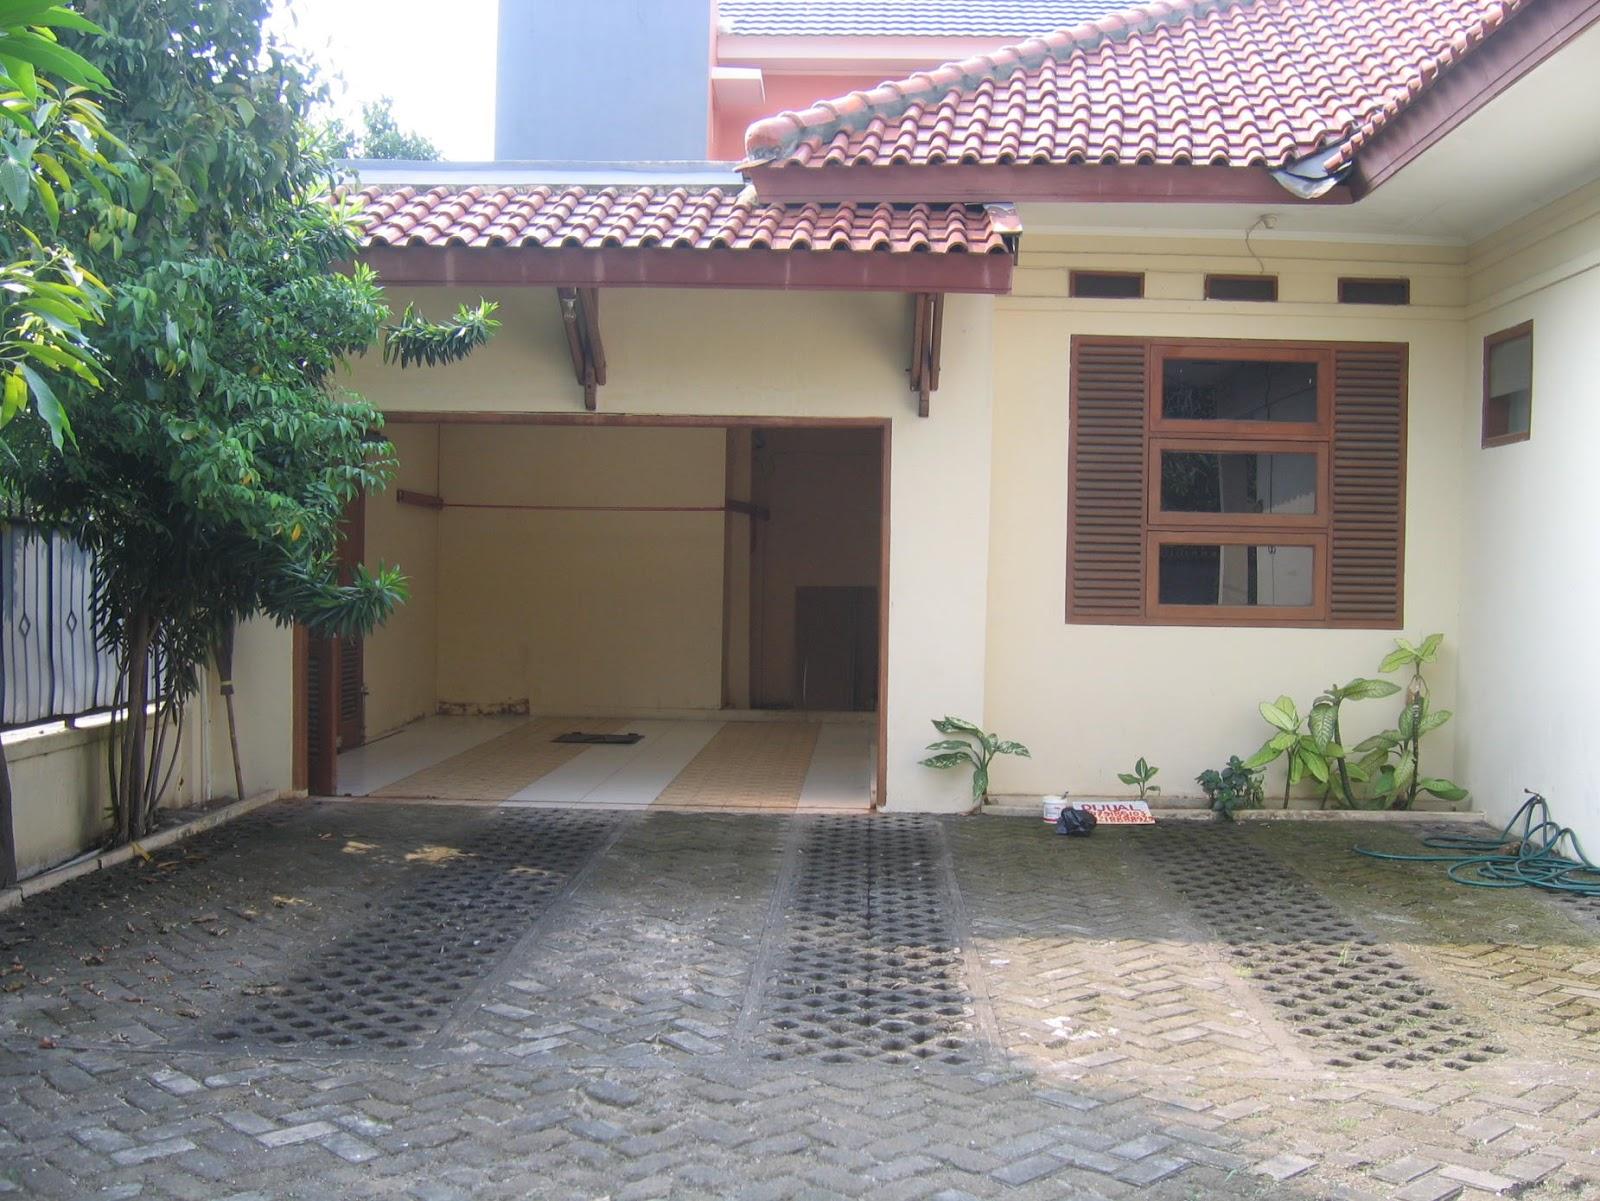 101 Denah Rumah Minimalis Garasi Di Dalam